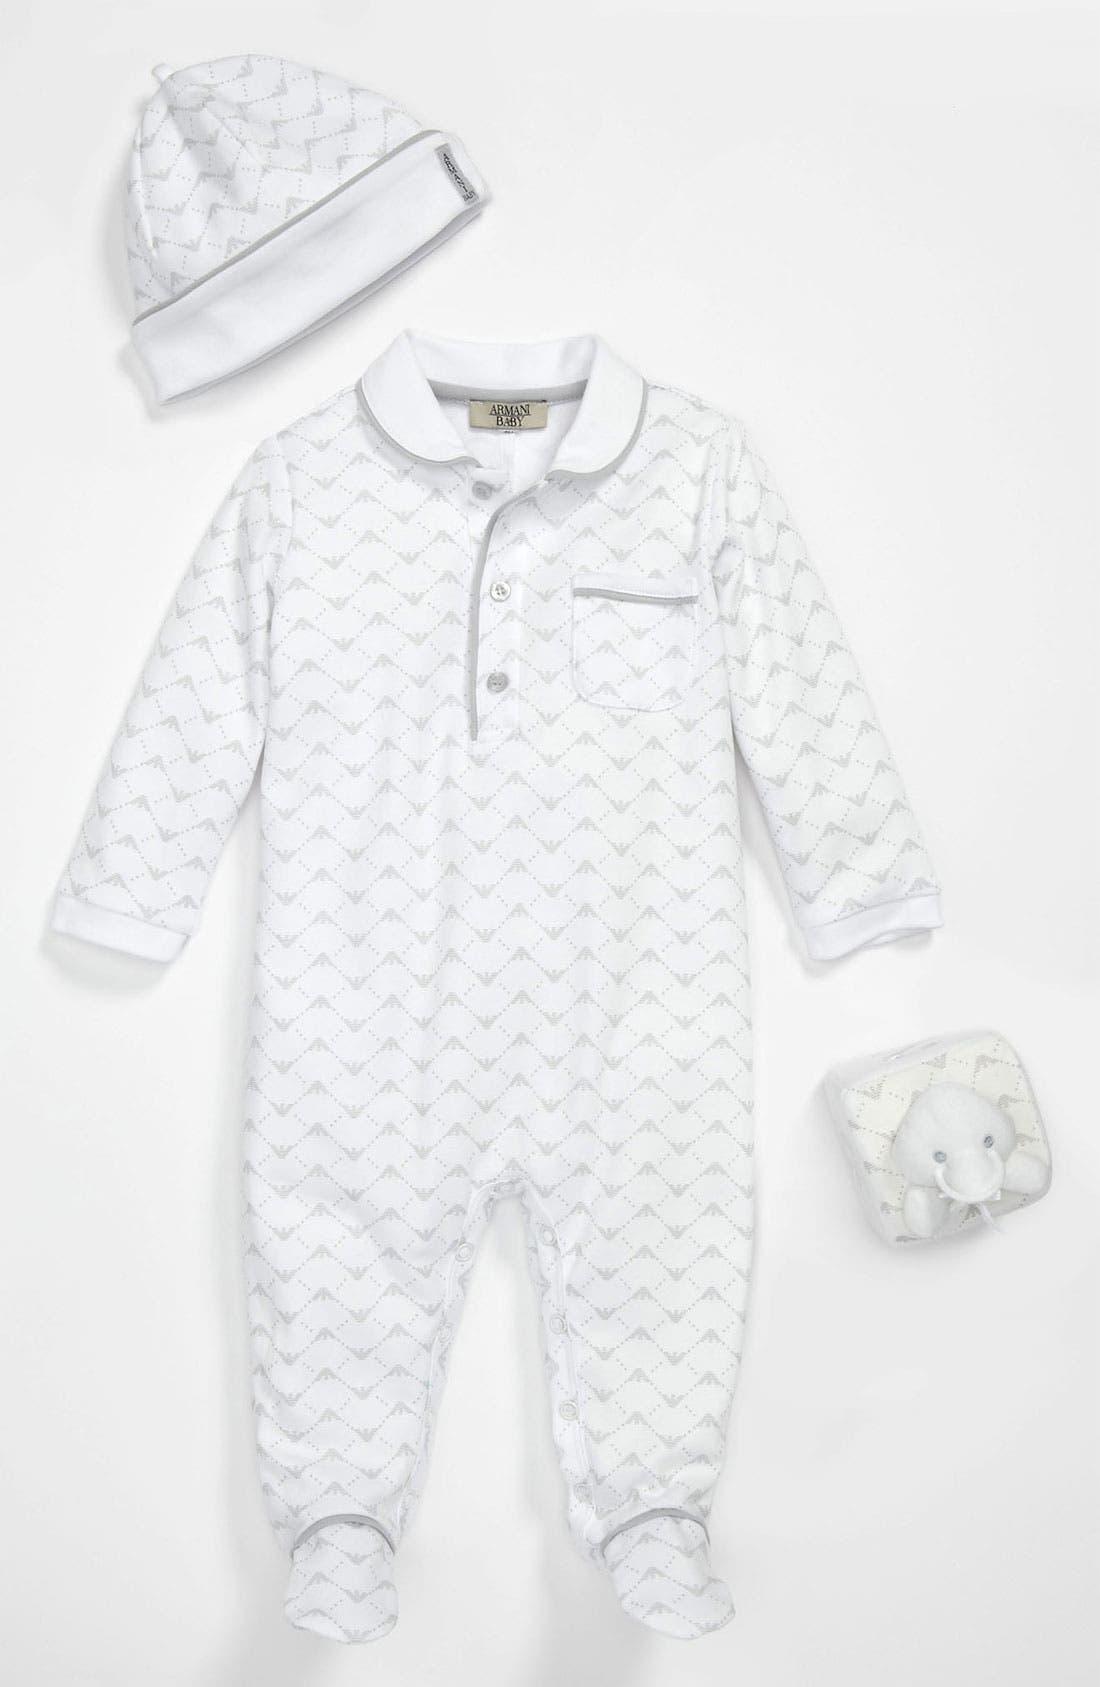 Main Image - Armani Junior Footie, Cap & Toy Set (Infant)